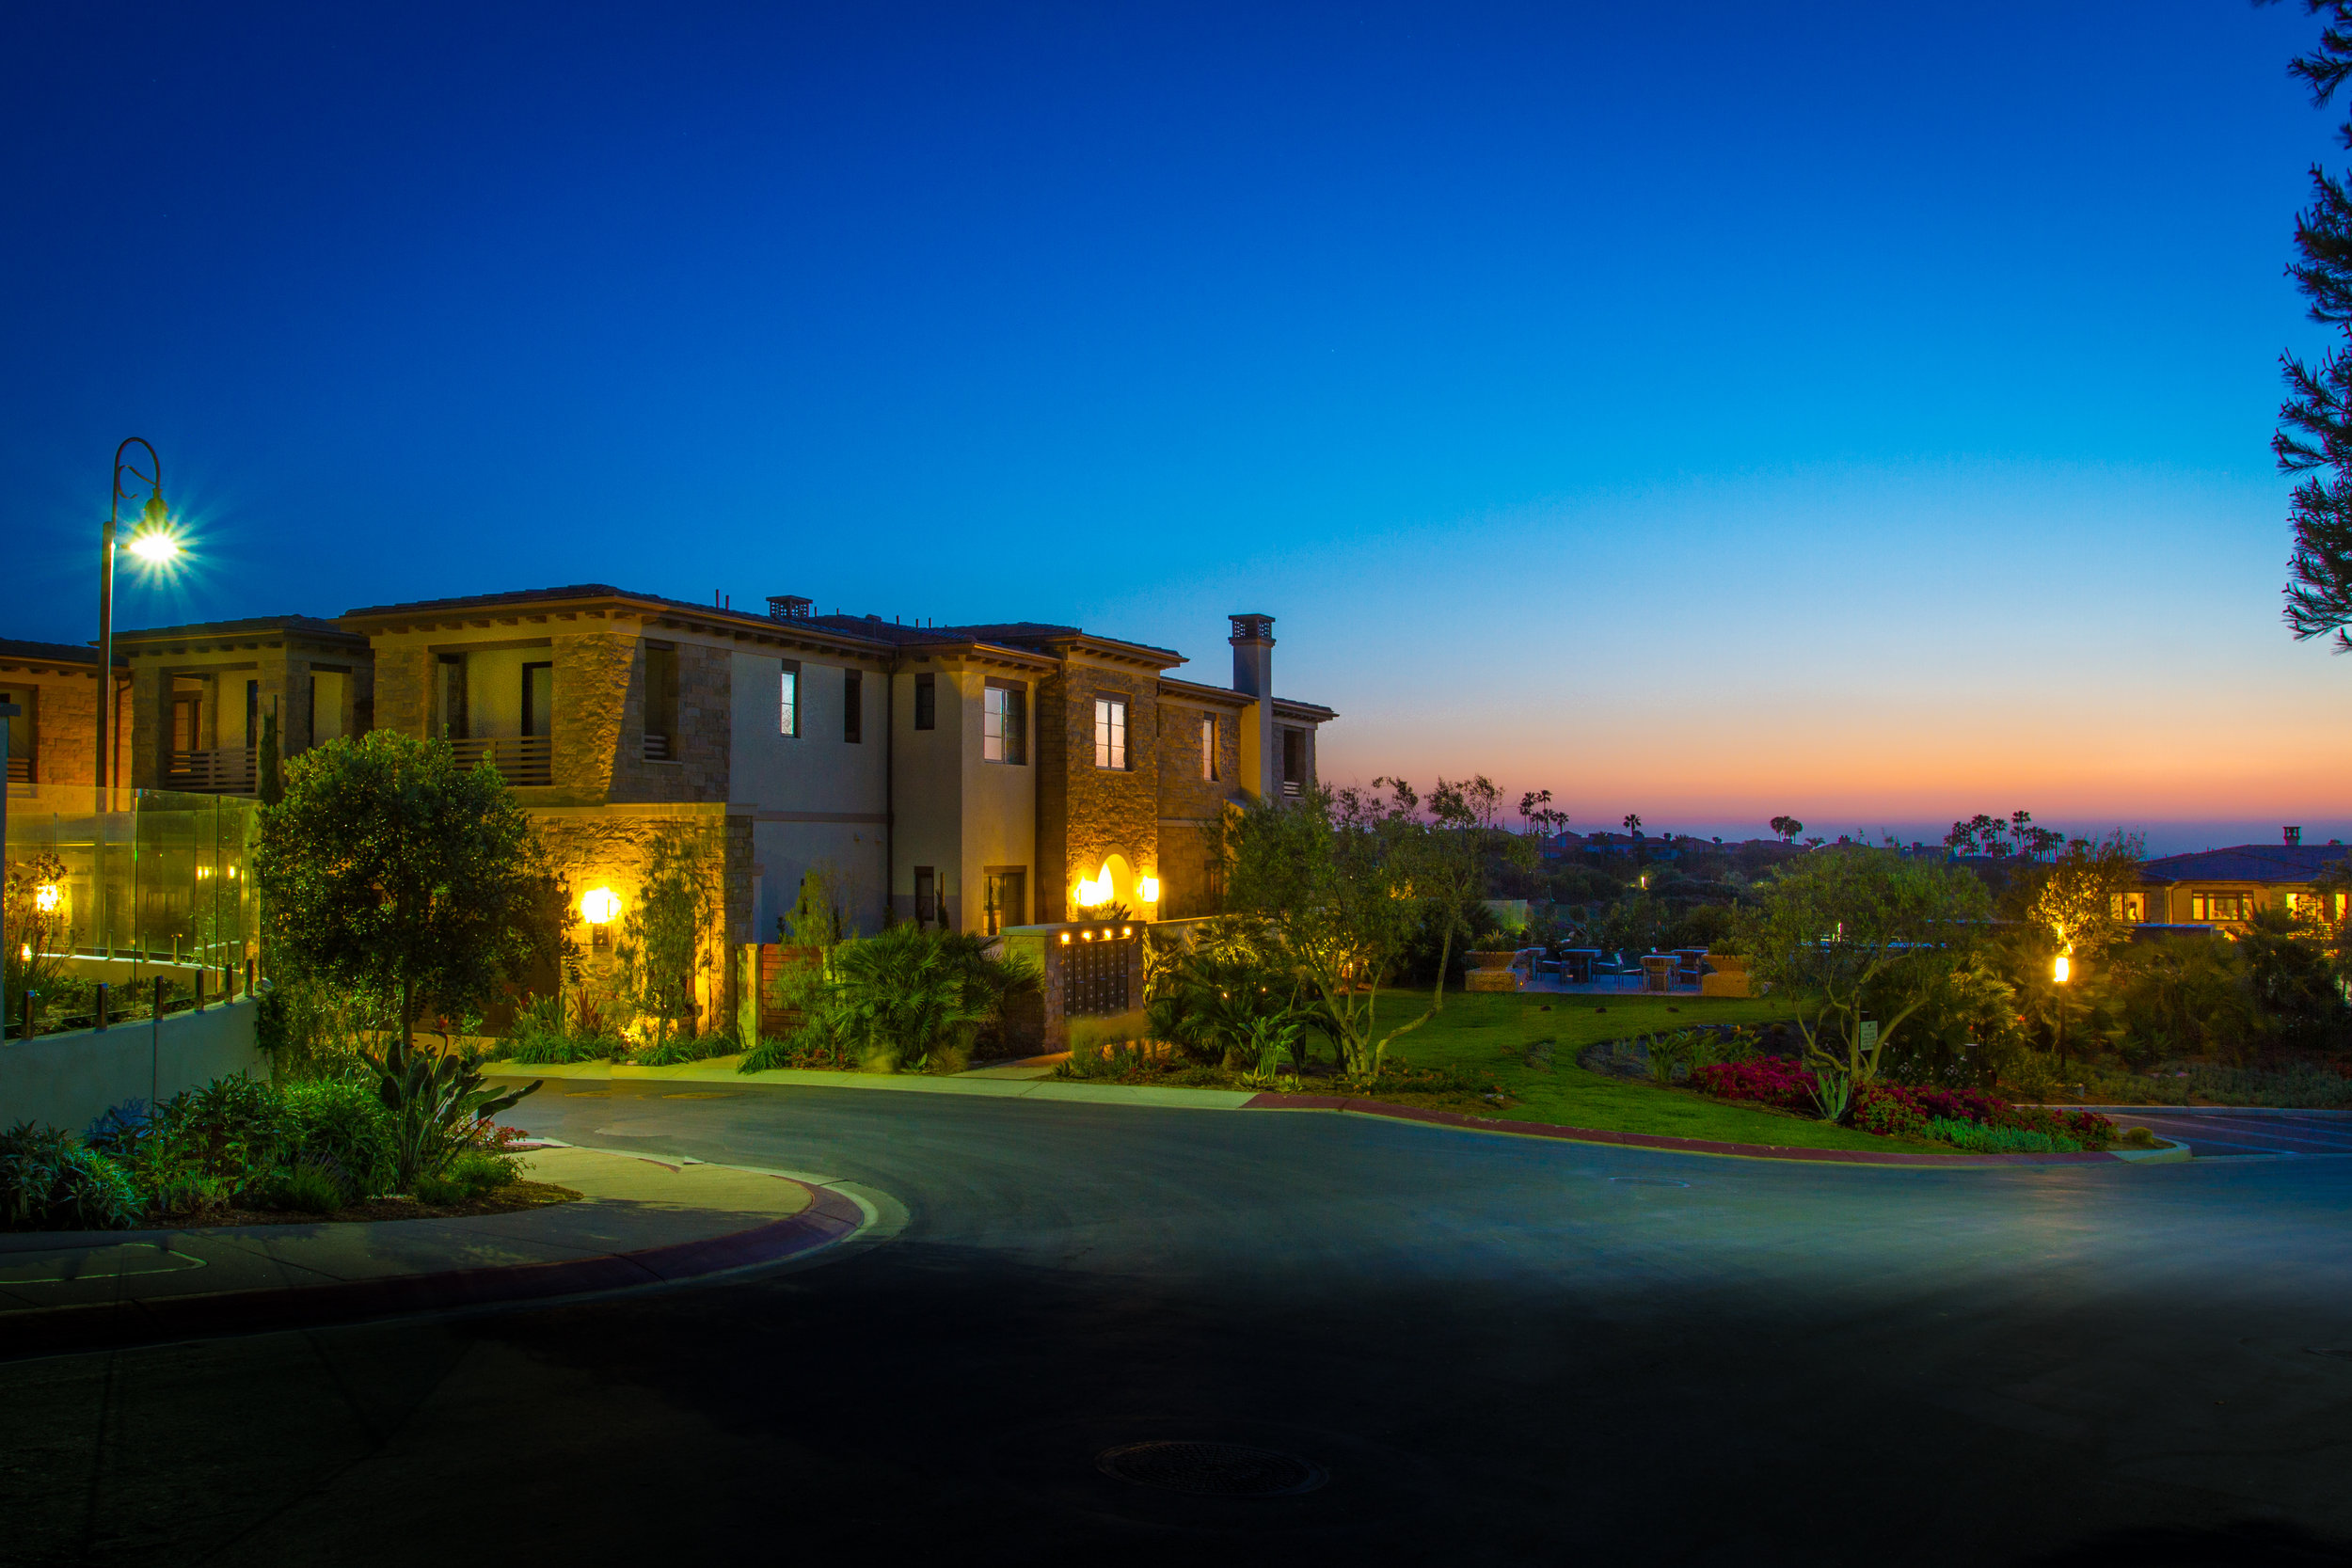 Lighting Maintenance Orange County | Lighting Maintenance San Diego |  Lighting Maintenance Inland Empire | Lighting